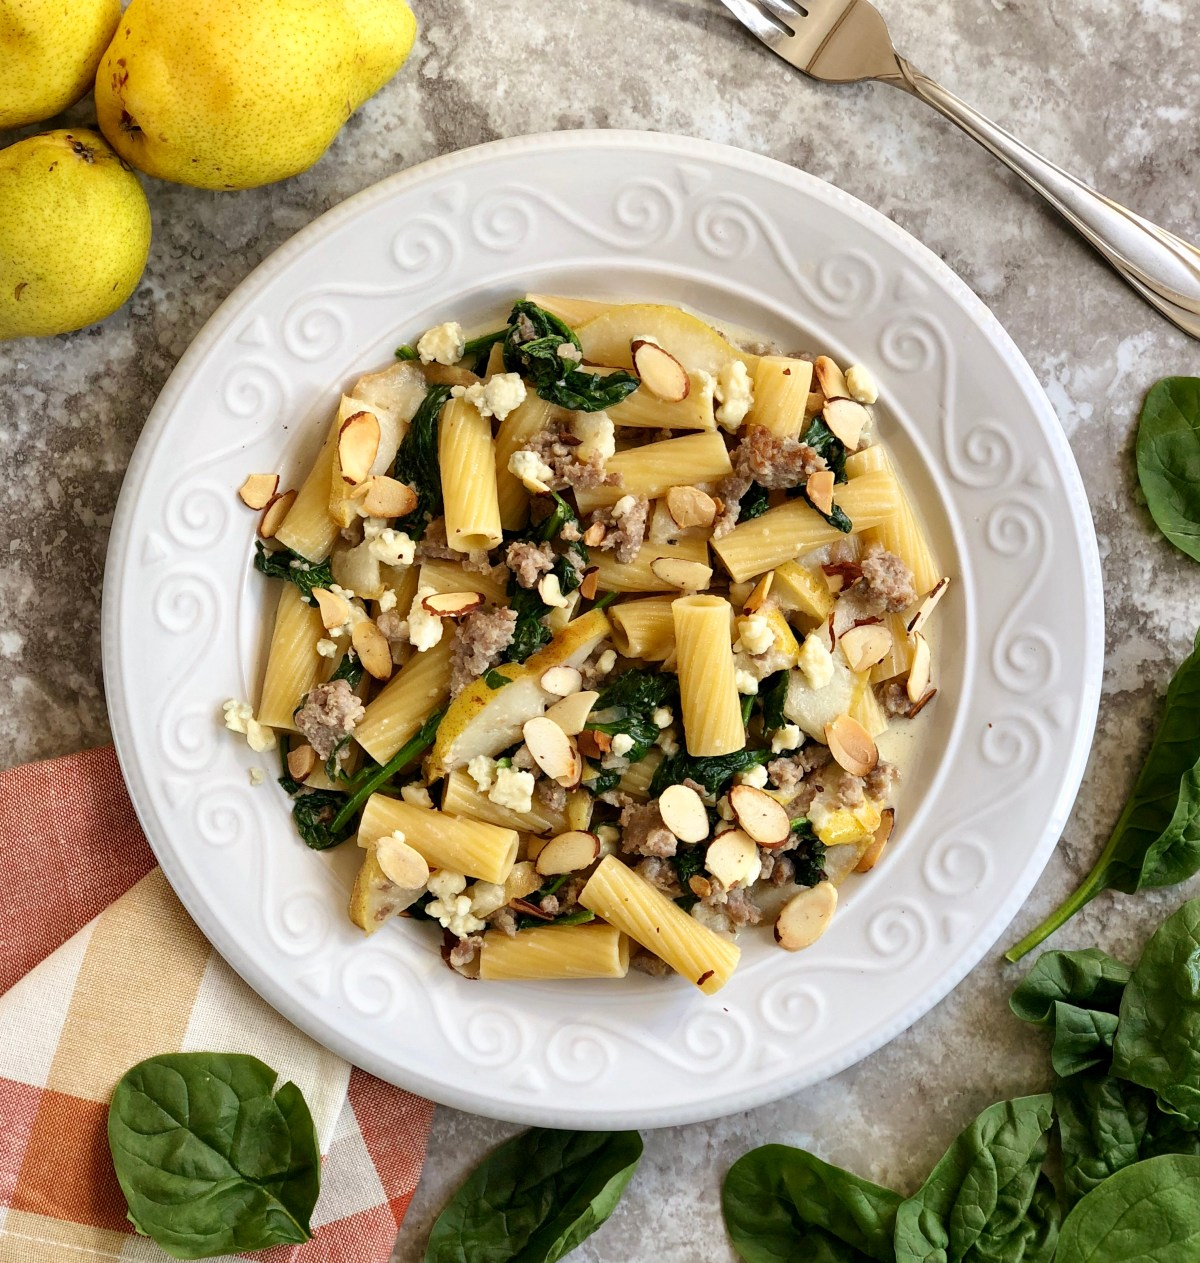 Pear & Sausage Rigatoni by Happylifeblogspot.com #pearrecipes #rigatoni #pasta #sausagerigatoni #fallrecipes #dinnerrecipe